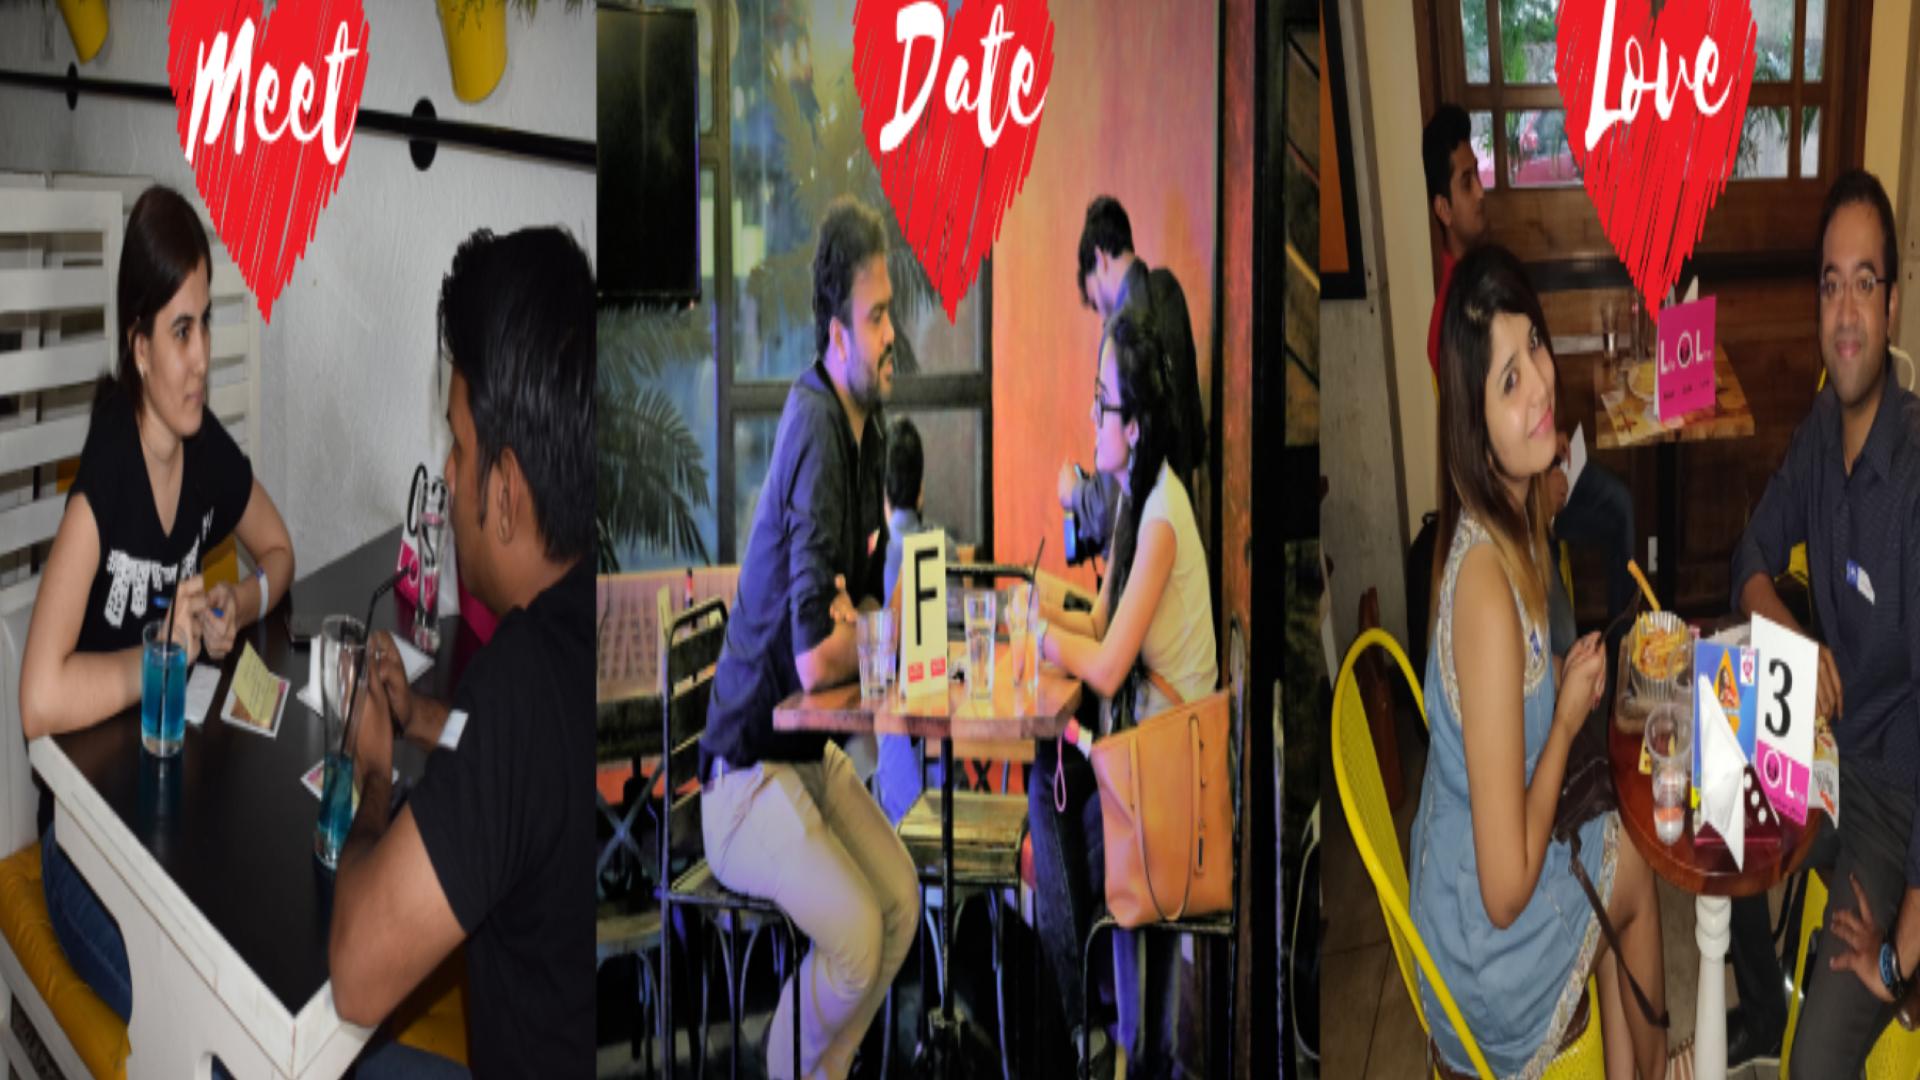 dating Delhi Senior Dating Sites i Singapore